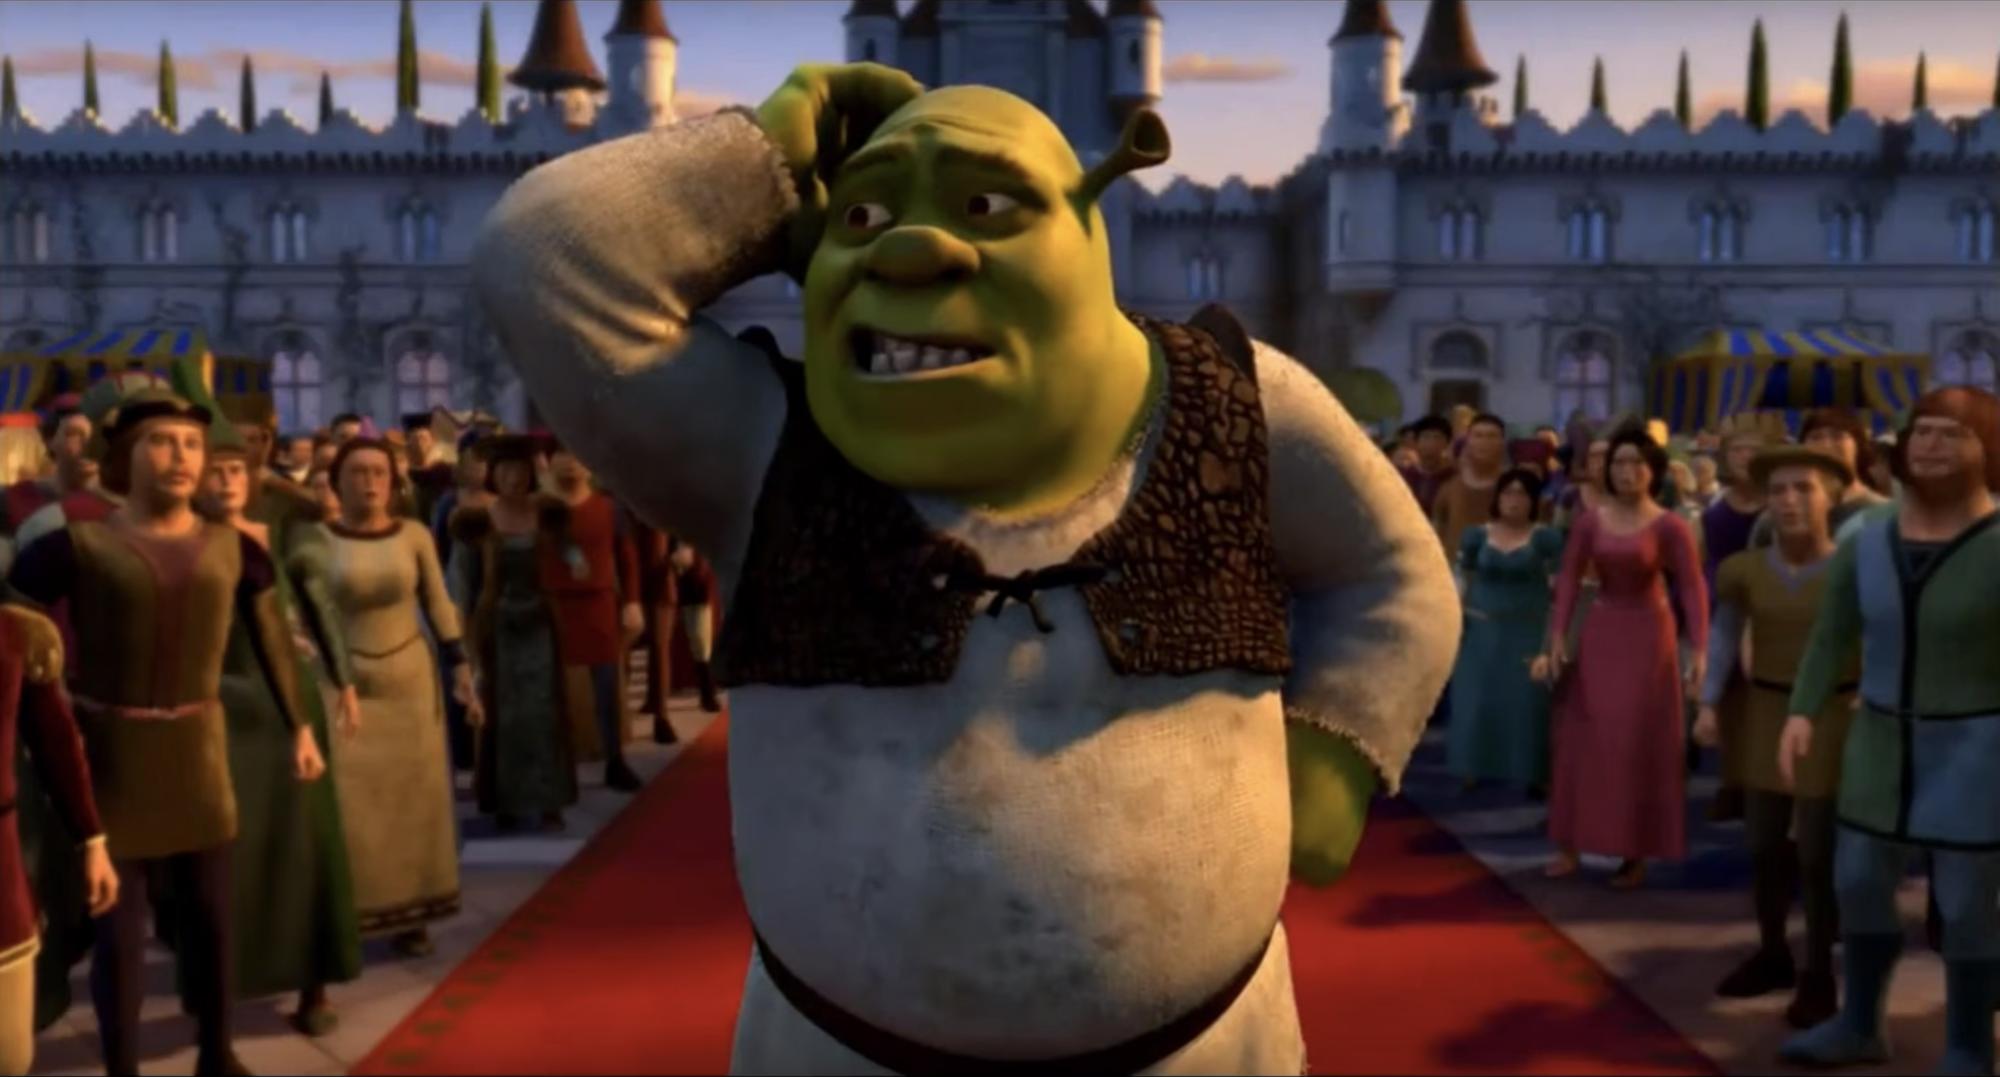 Unpopular Opinion Shrek 2 Is Better Than Shrek Arts The Harvard Crimson